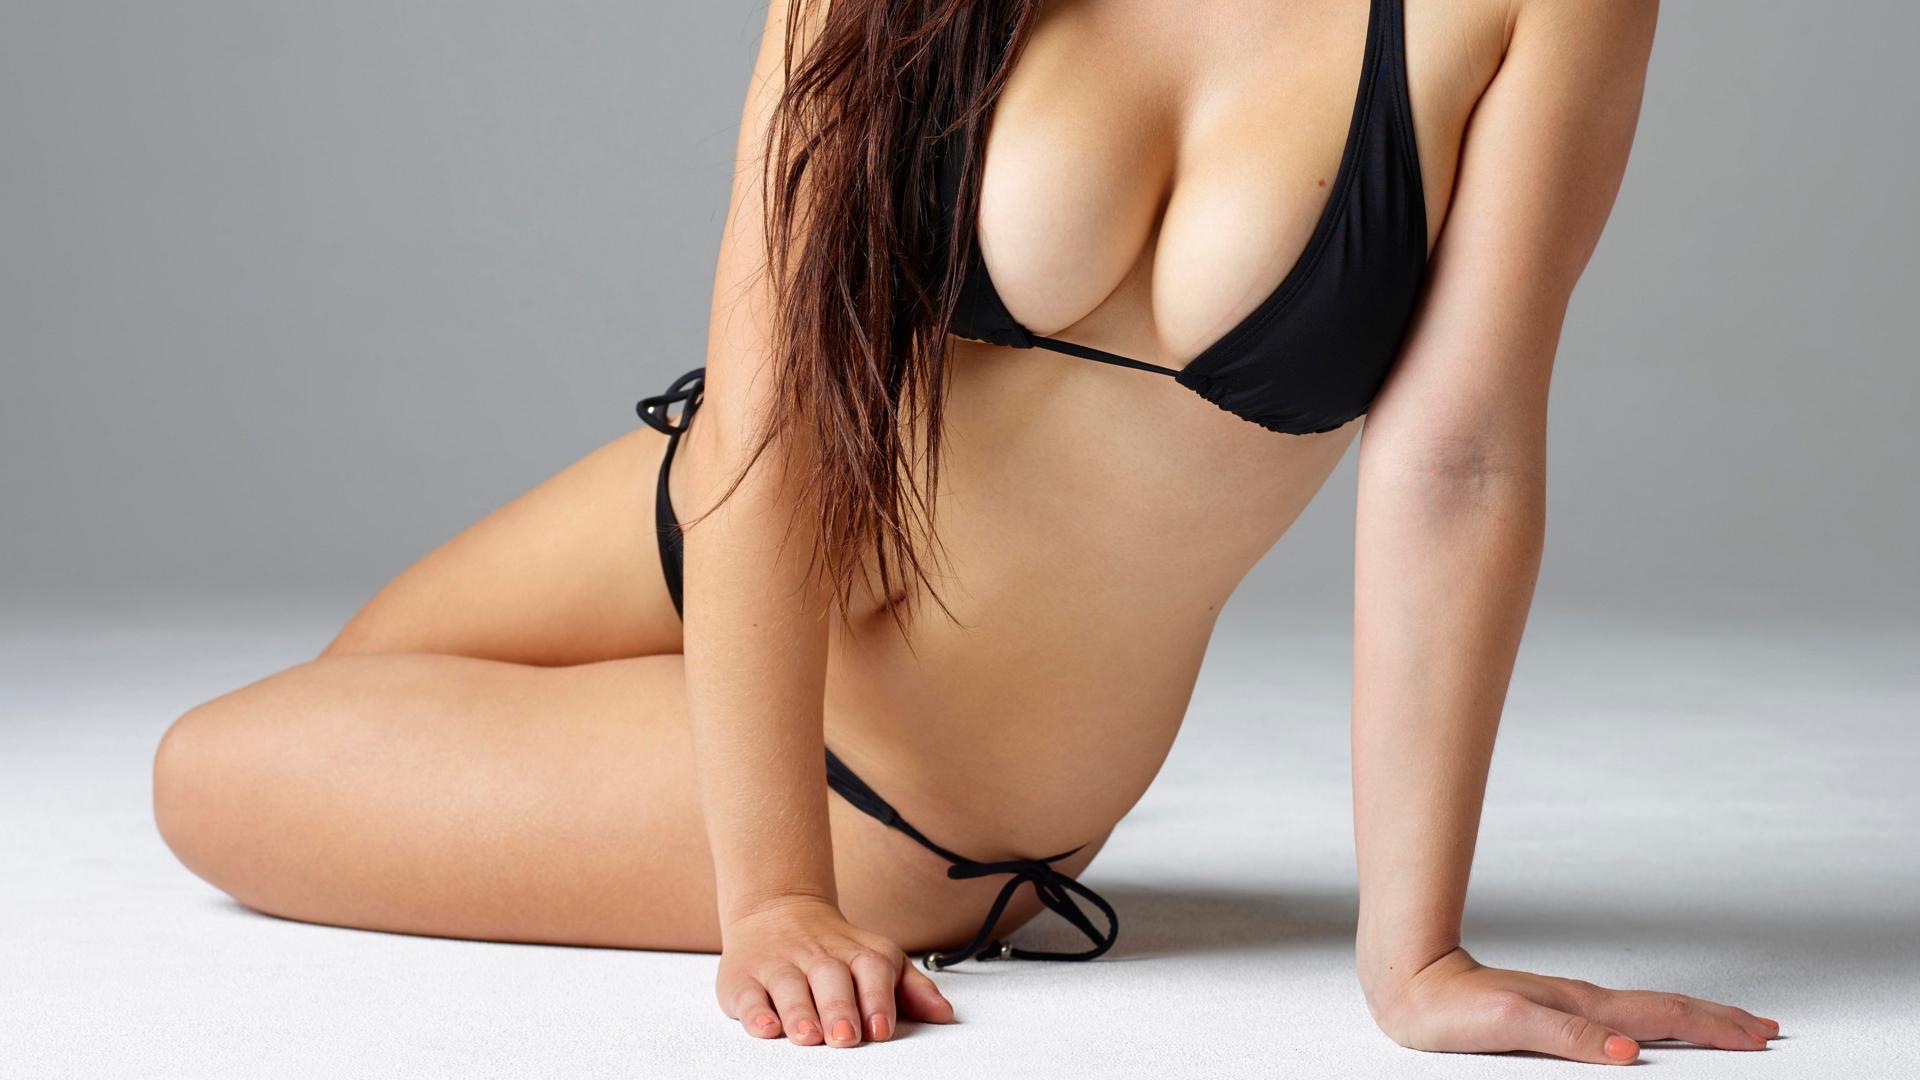 download photo 1920x1080 yara girl lingerie breasts